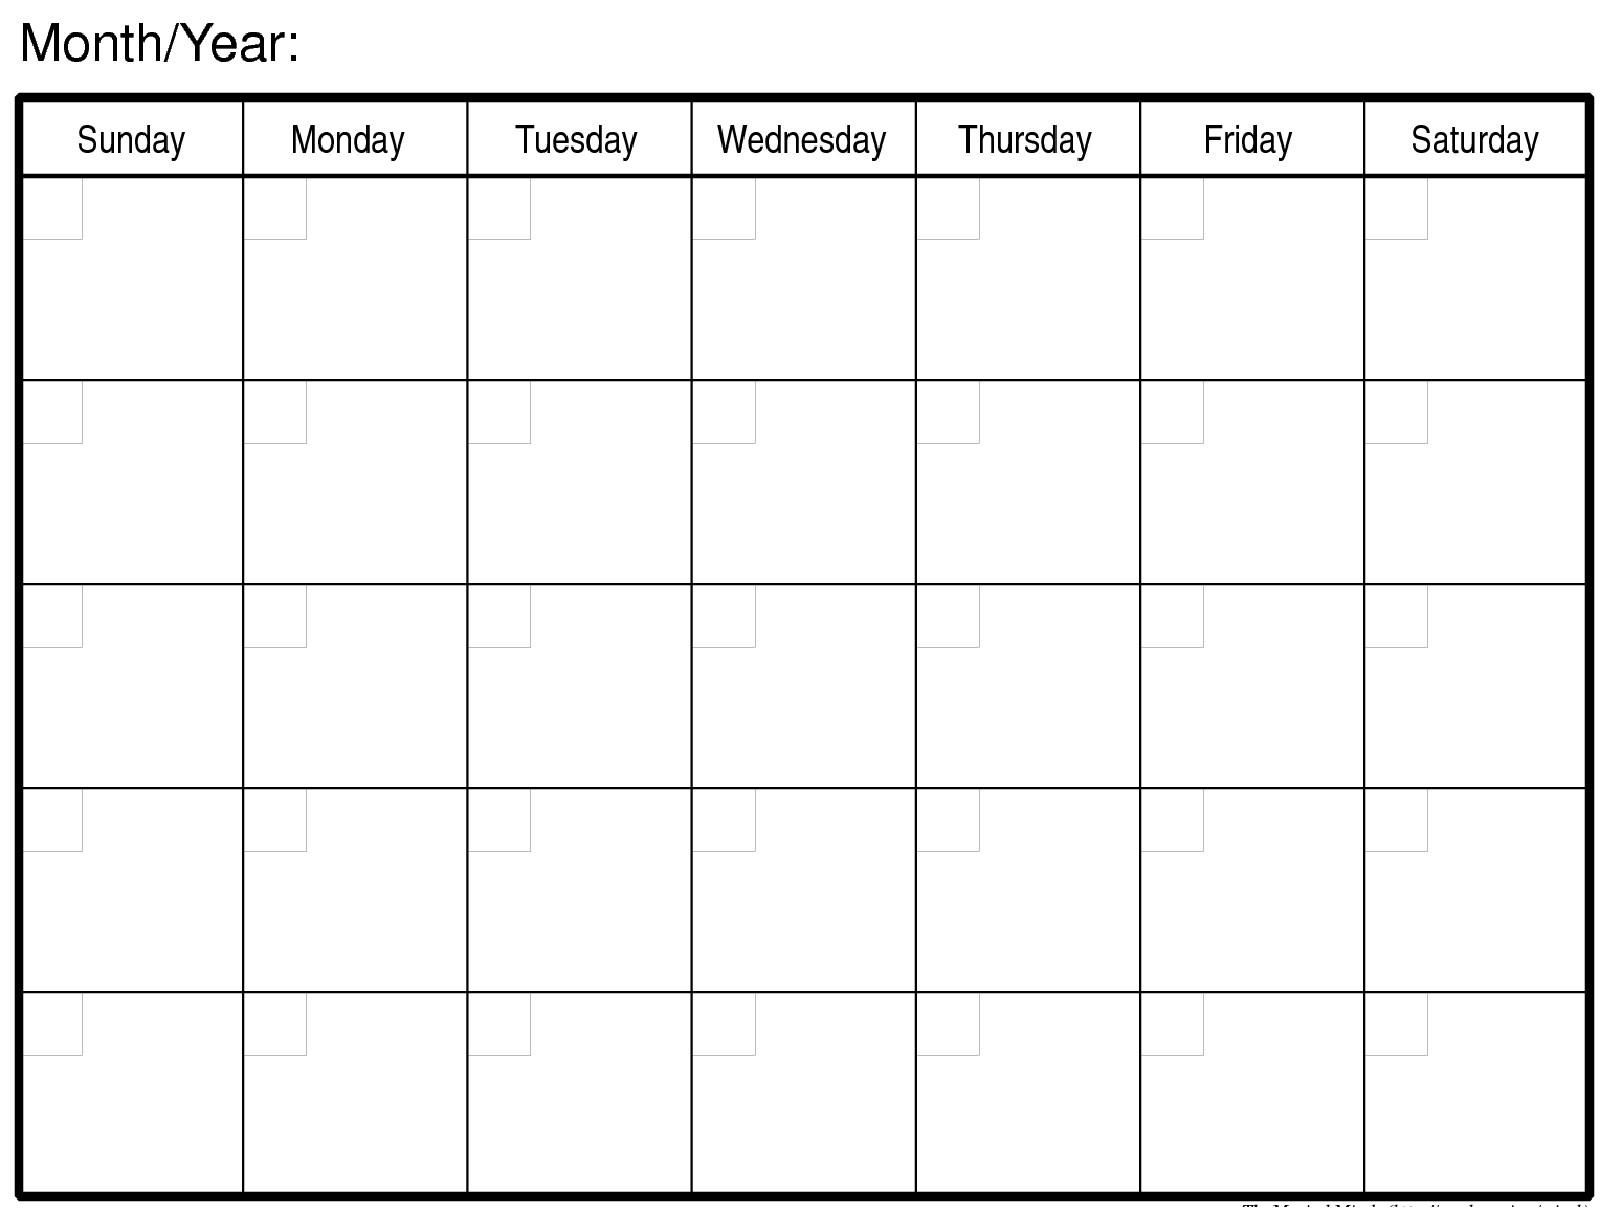 Blank Monthly Calendar Print Out :-Free Calendar Template  Free Printable Blank Monthly Calendar Templates